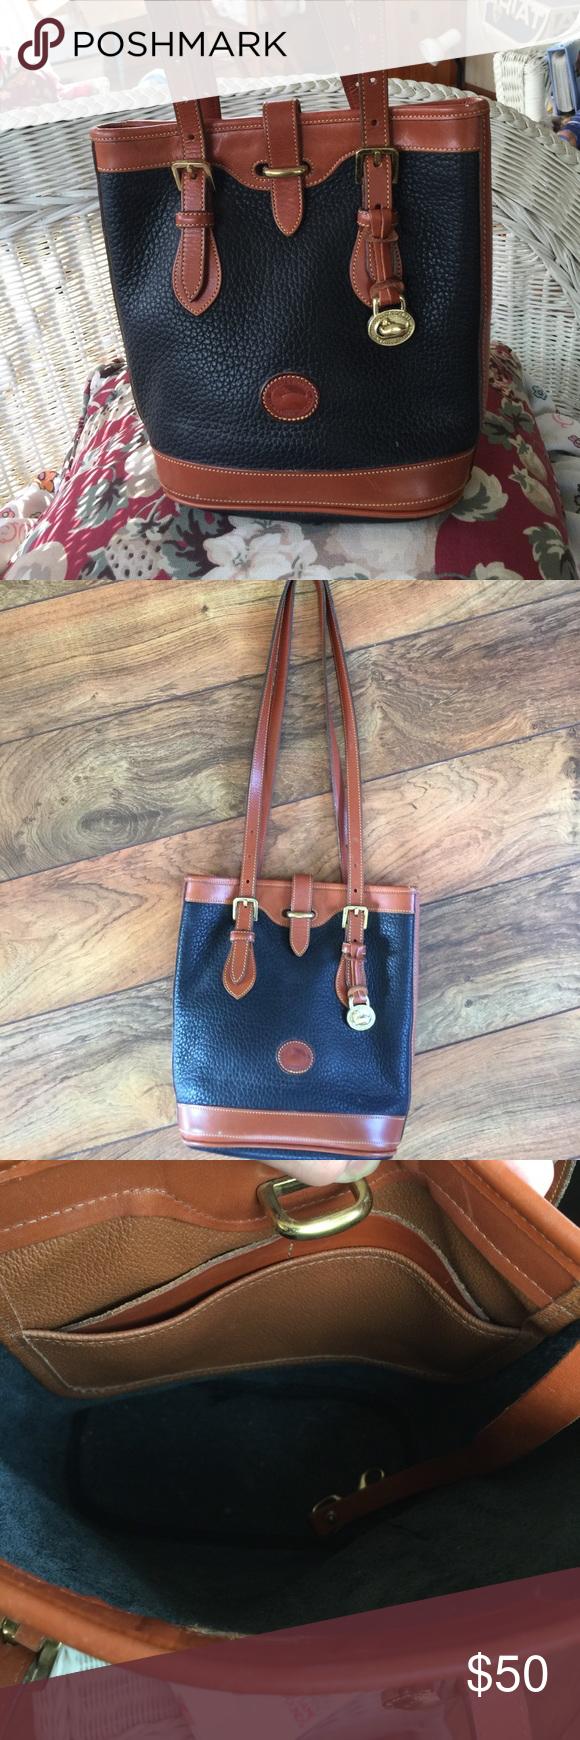 44b650ce3f Vintage Downey   Bourke Bucket Bag Genuine leather smaller bucket bag.  Excellent condition. Dooney   Bourke Bags Shoulder Bags